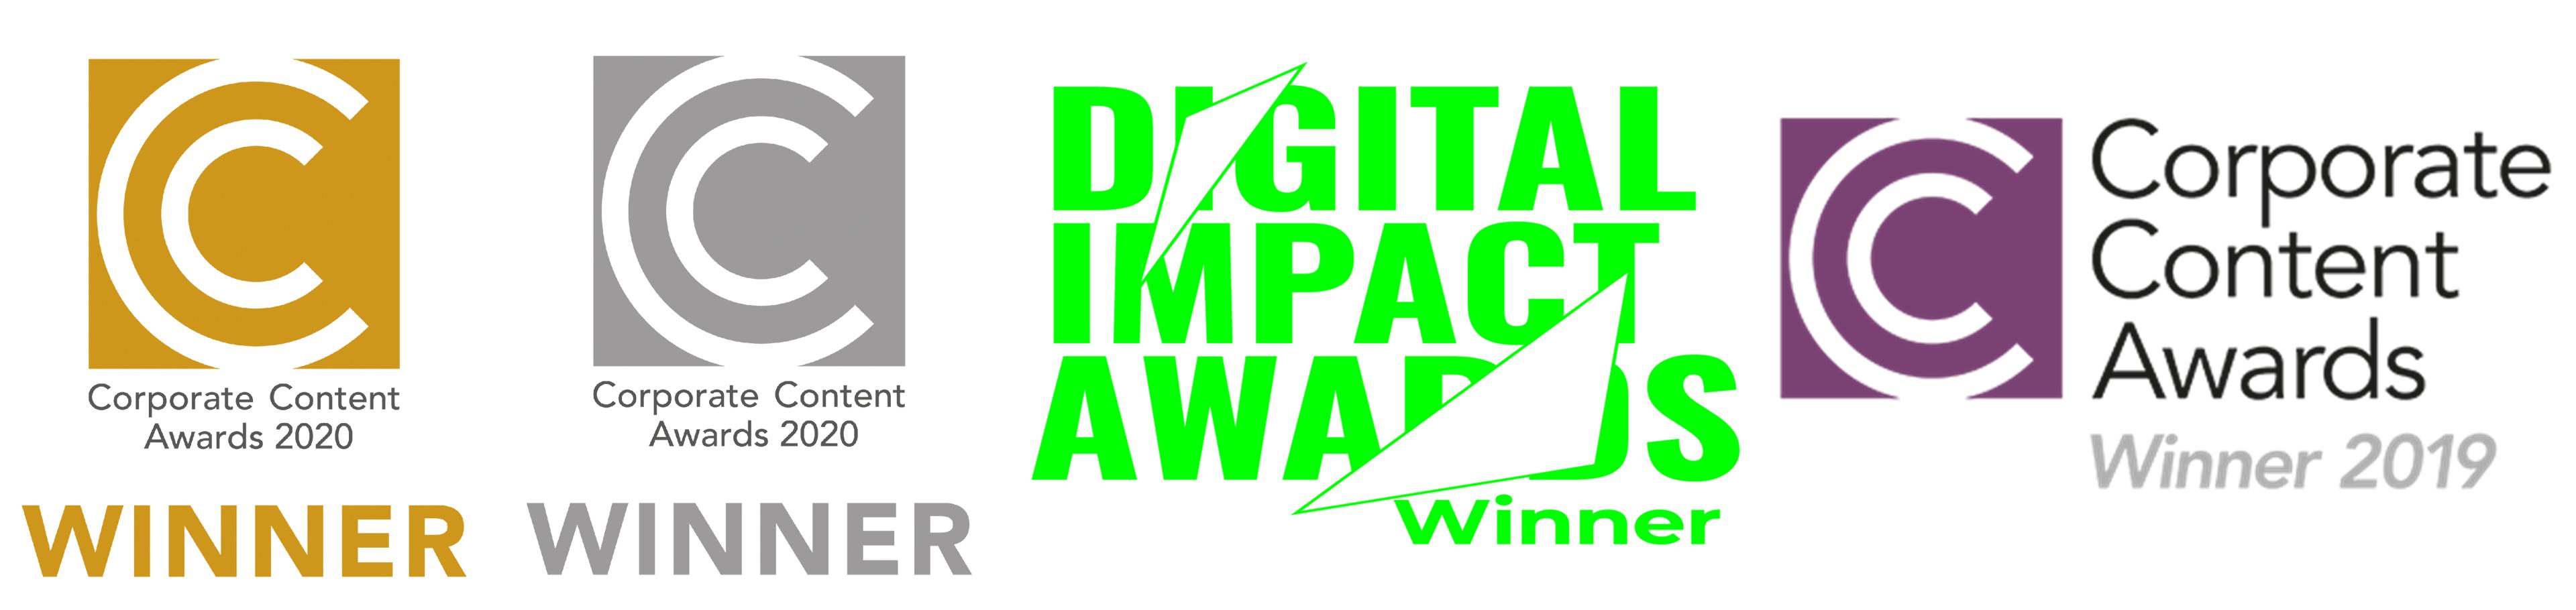 Corporate content awards winner logos